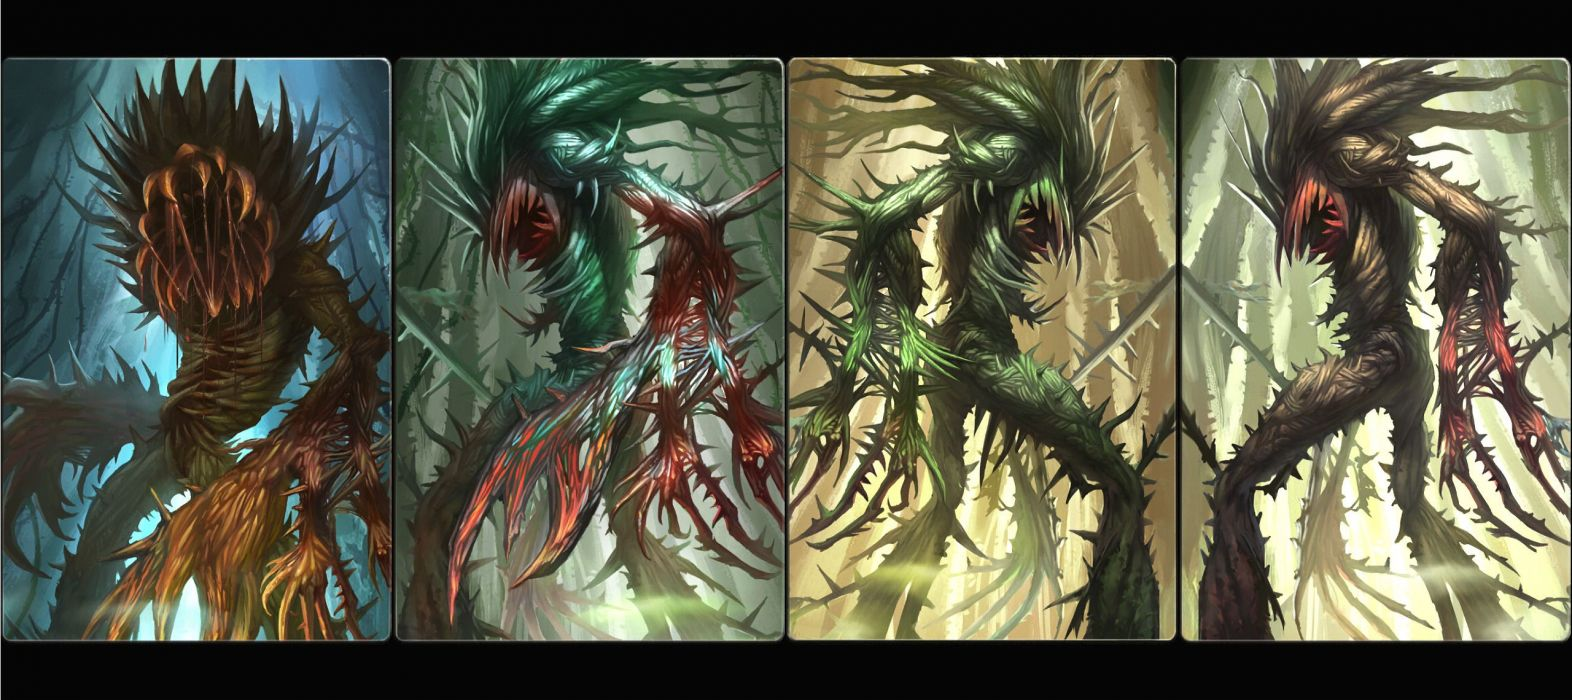 VANGUARD SAGA HEROES fantasy mmo rpg fighting online 1vsh action adventure monster creature wallpaper